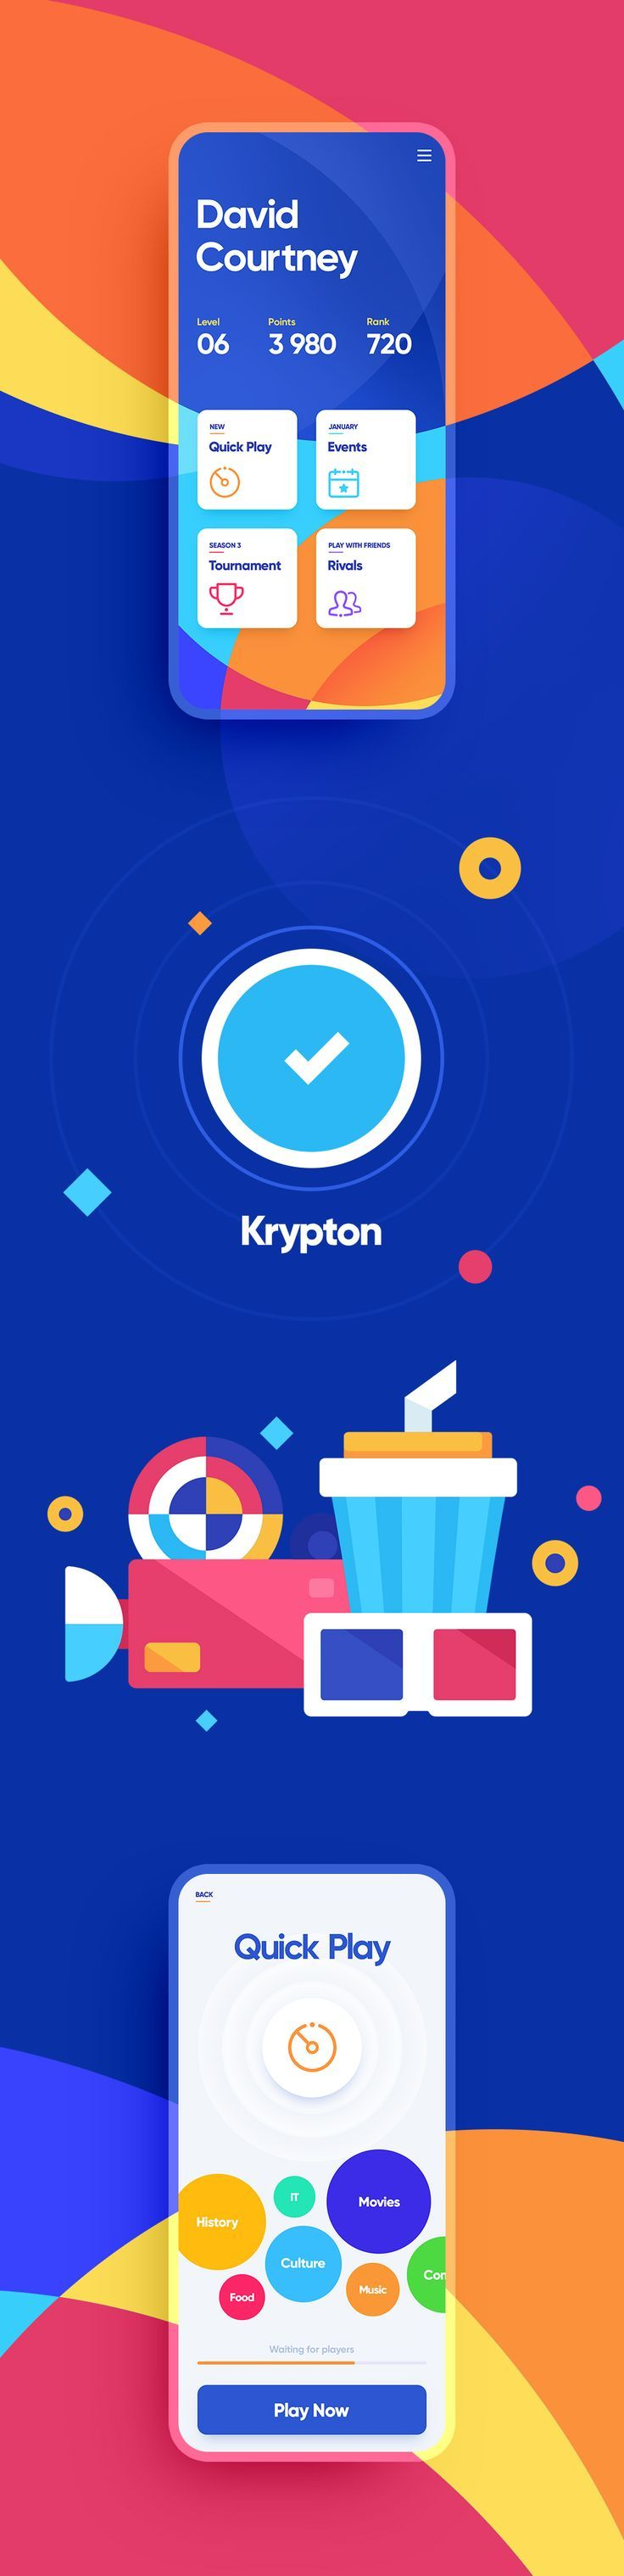 Ios app game quiz loading slider menu animation